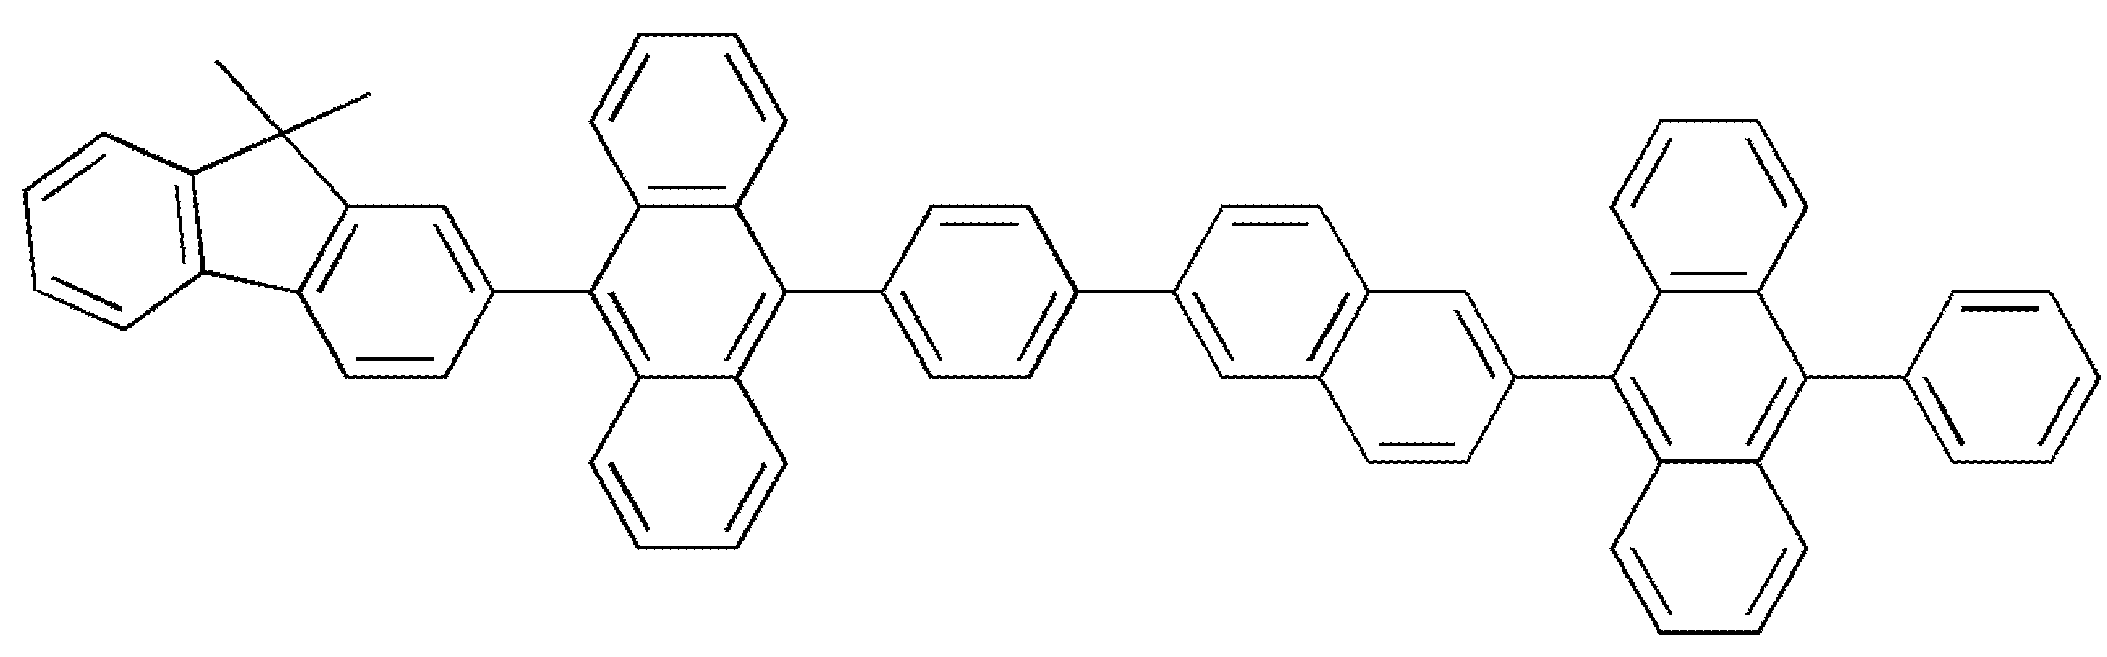 Figure 112007087103673-pat00667